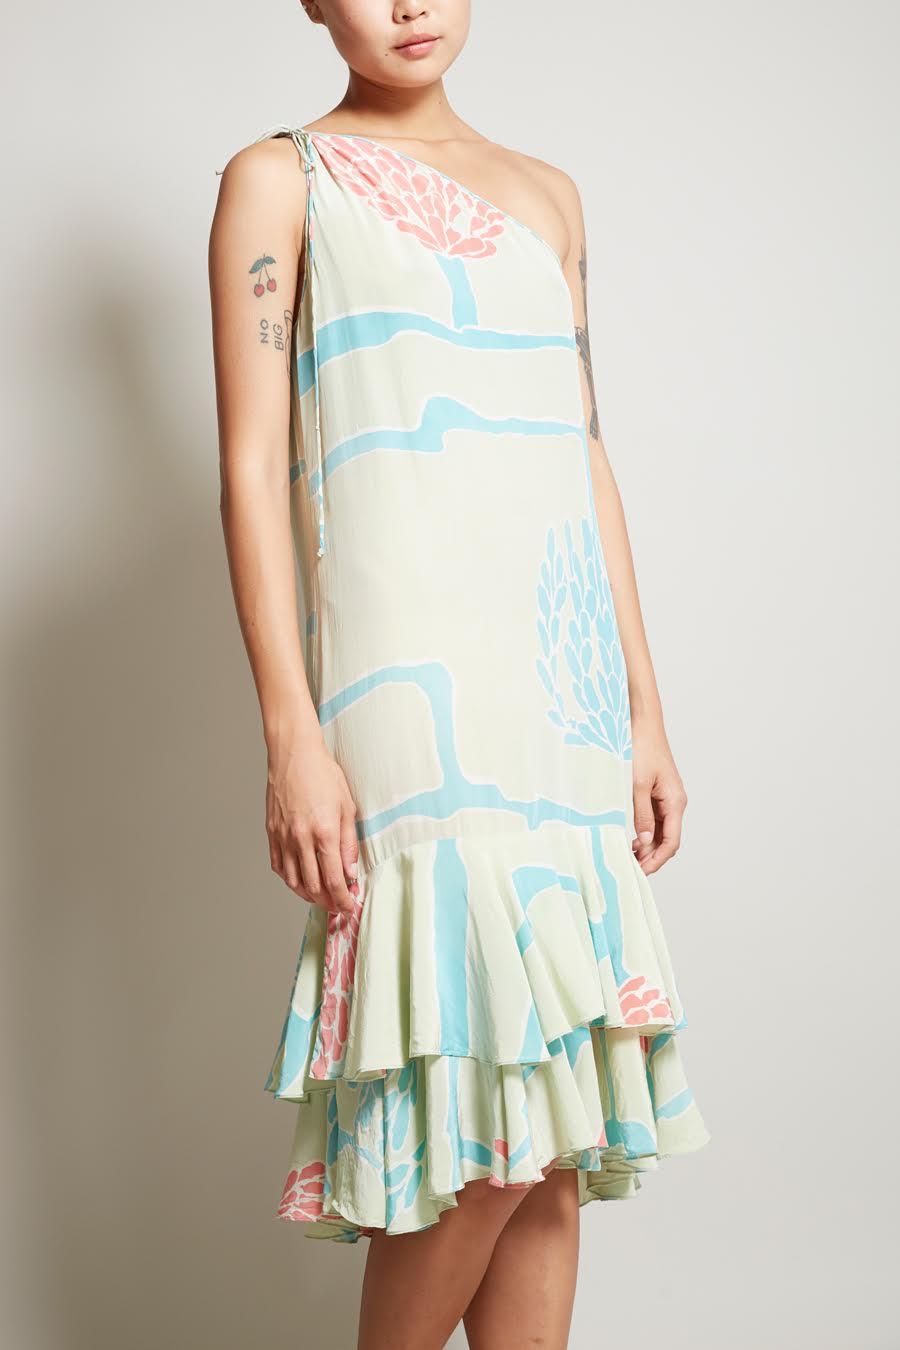 Mary McFadden one-shoulder dress, $70 (was $265)